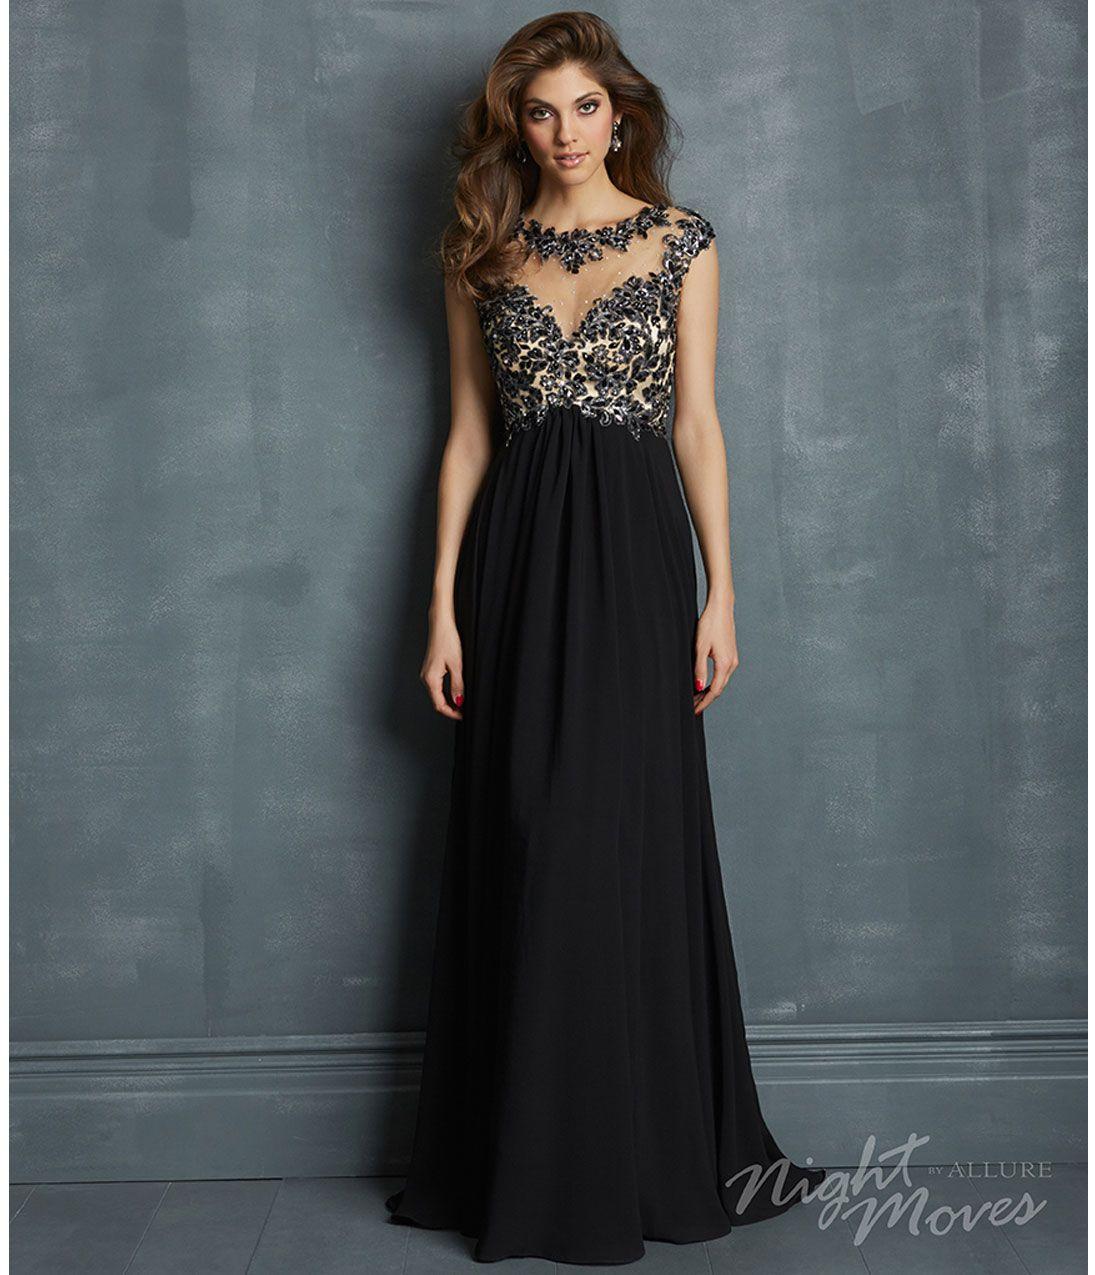 1940s Evening Dresses Online